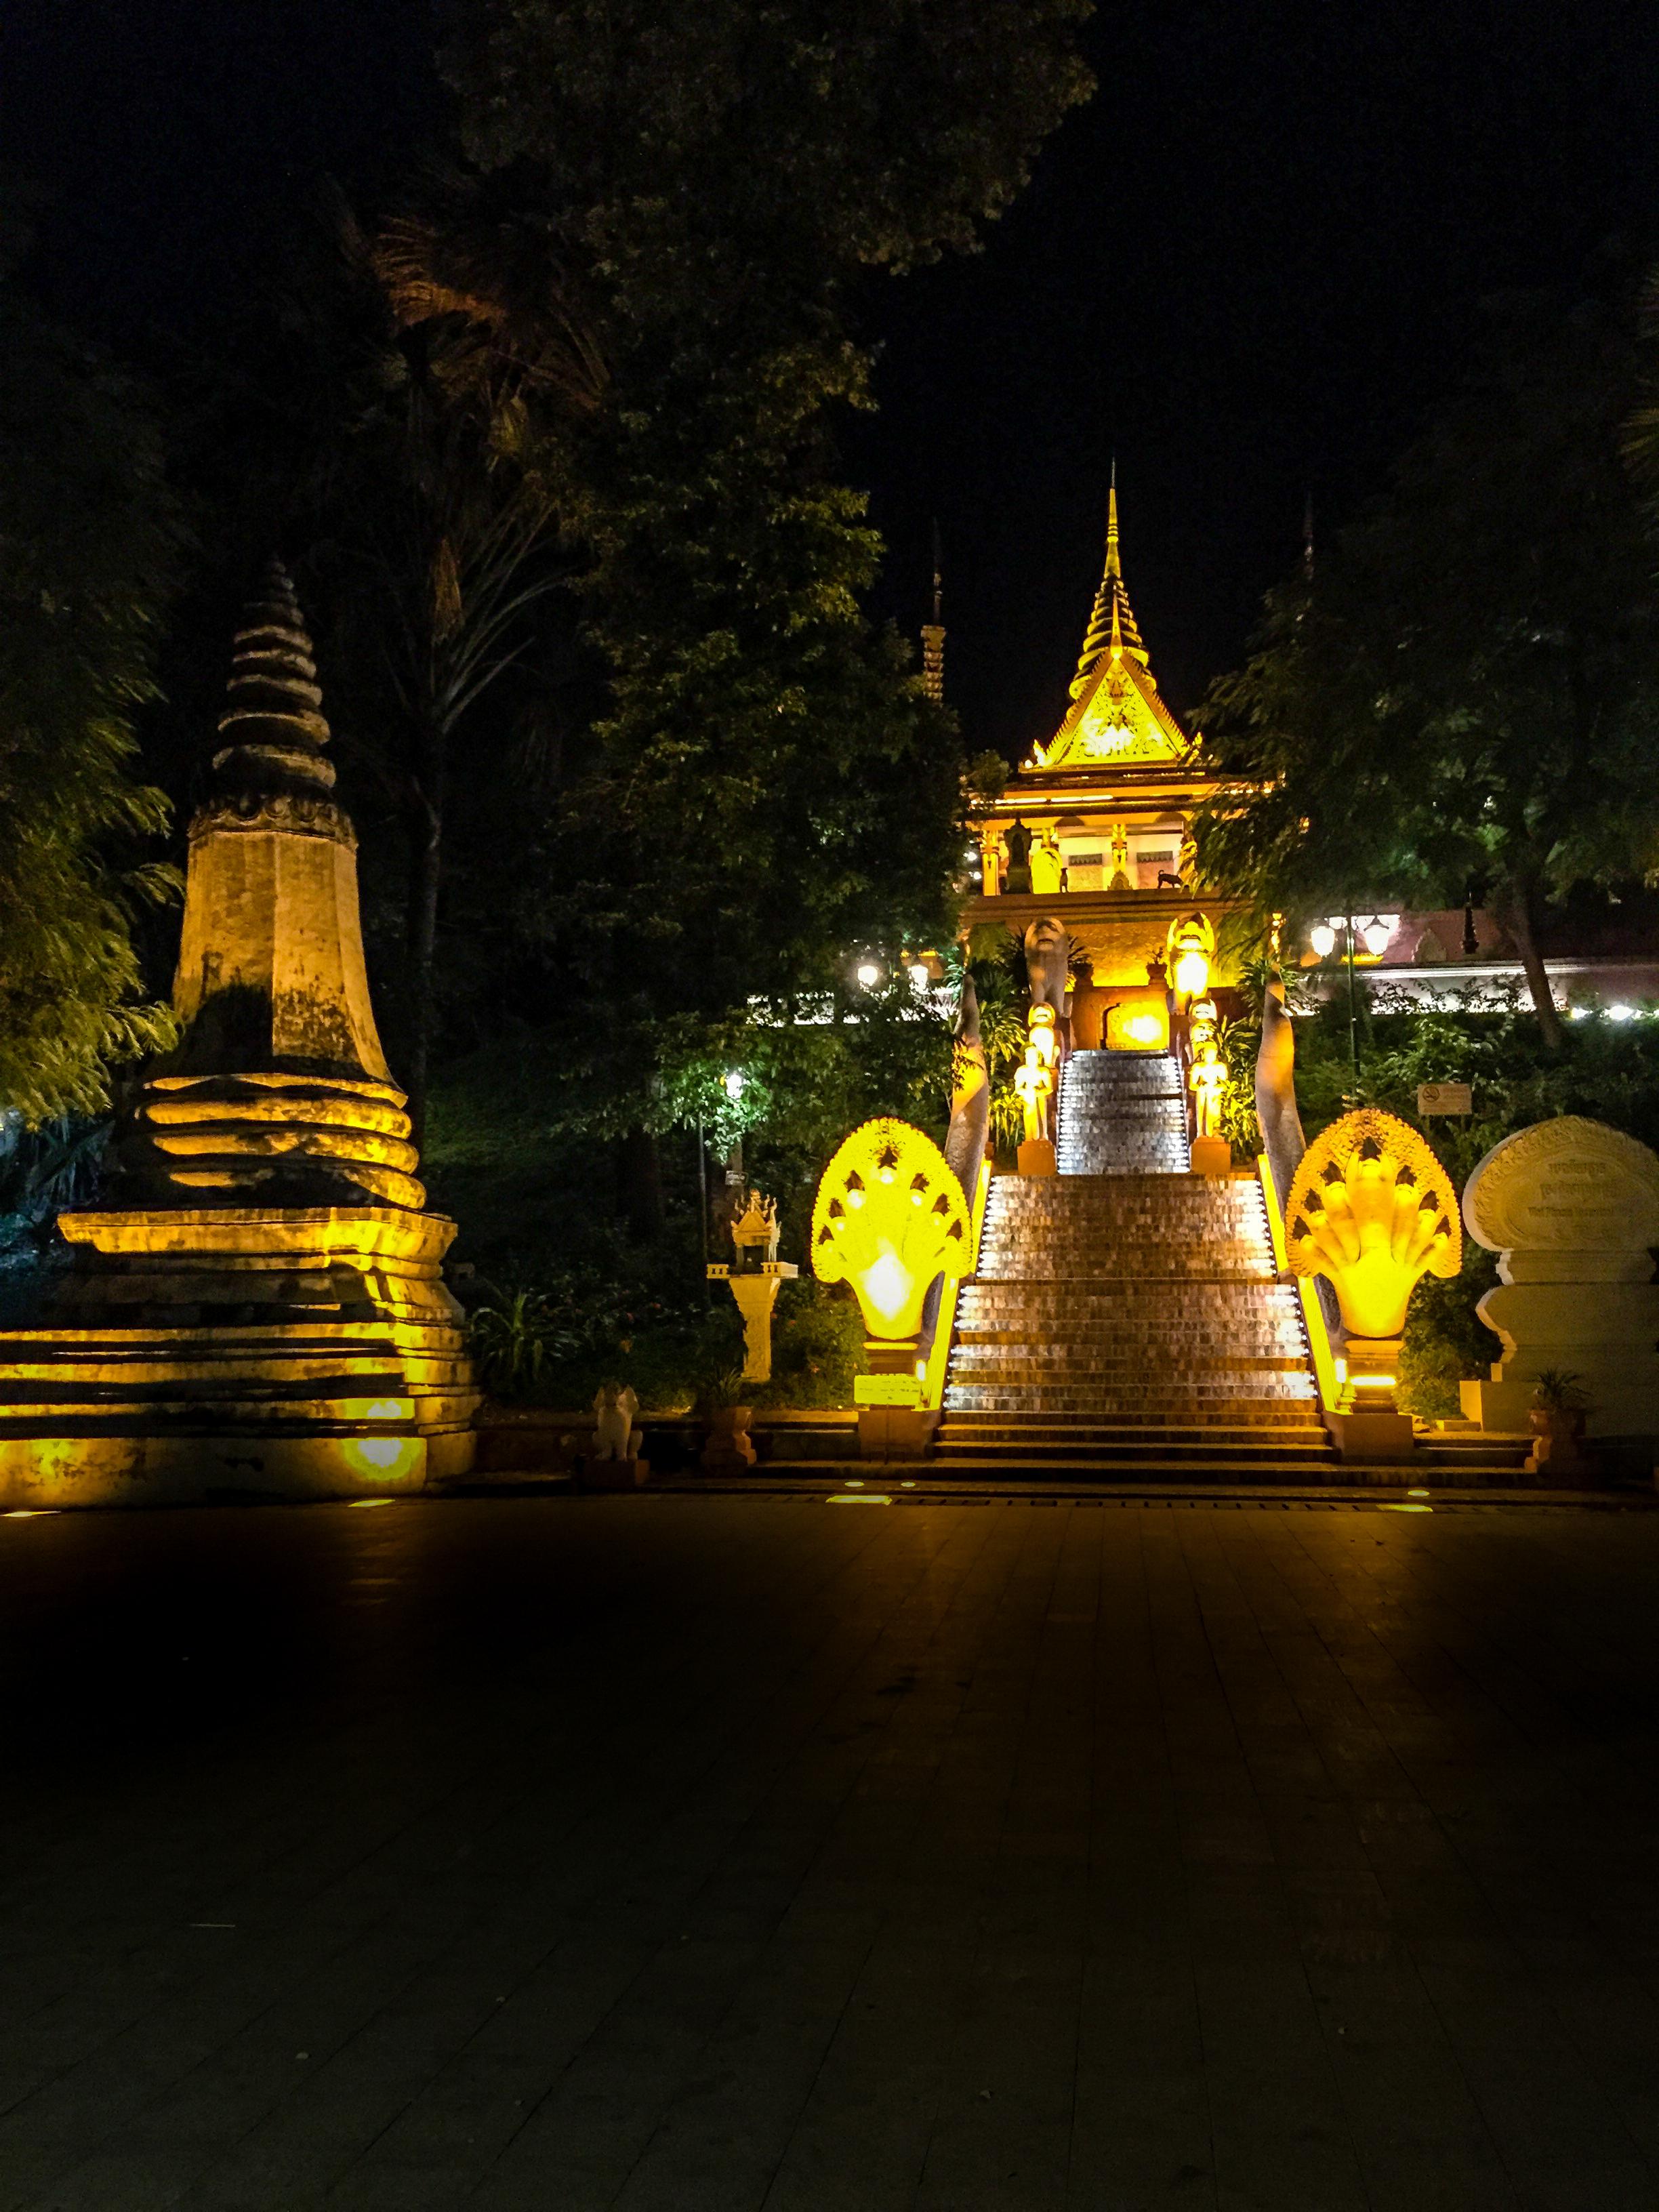 A beautiful Park in Phnom Penh, Cambodia